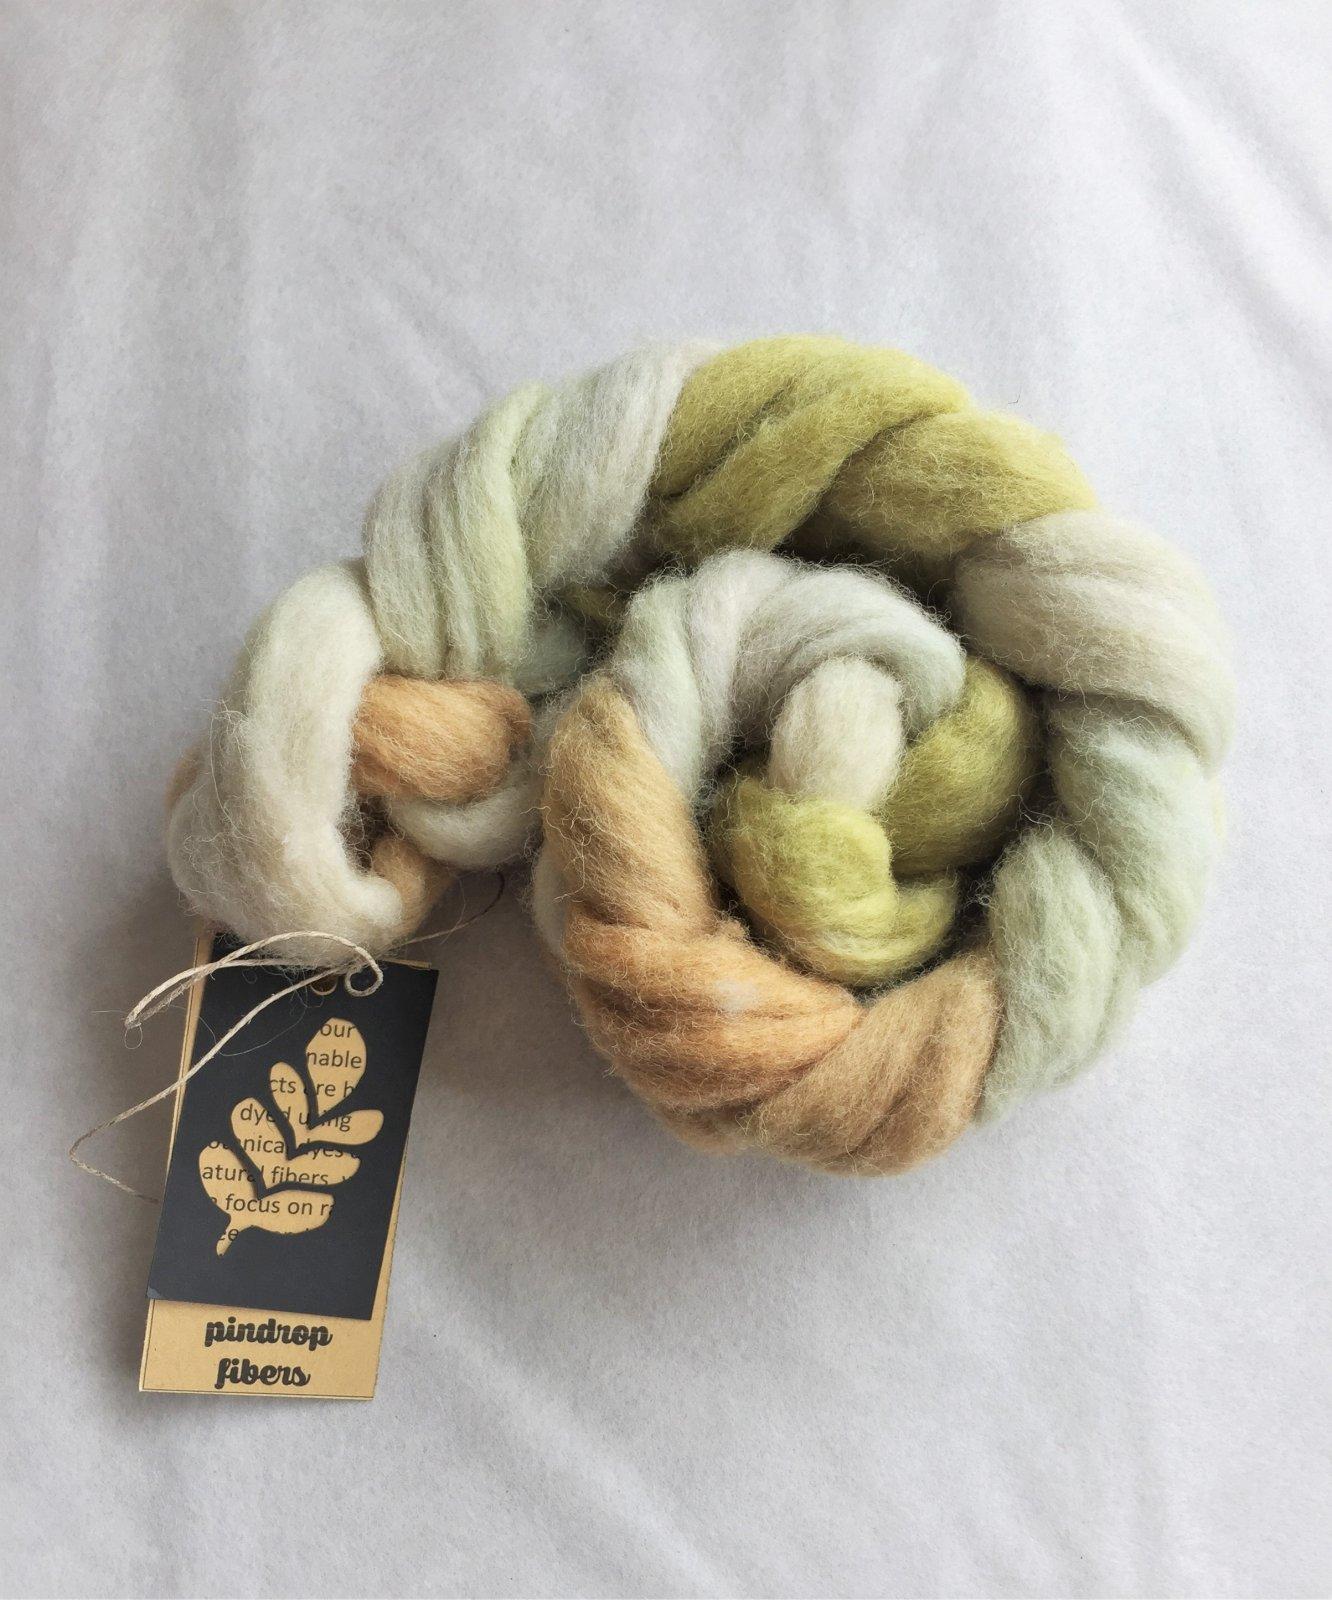 Southdown Wool Roving - Pindrop Fibers